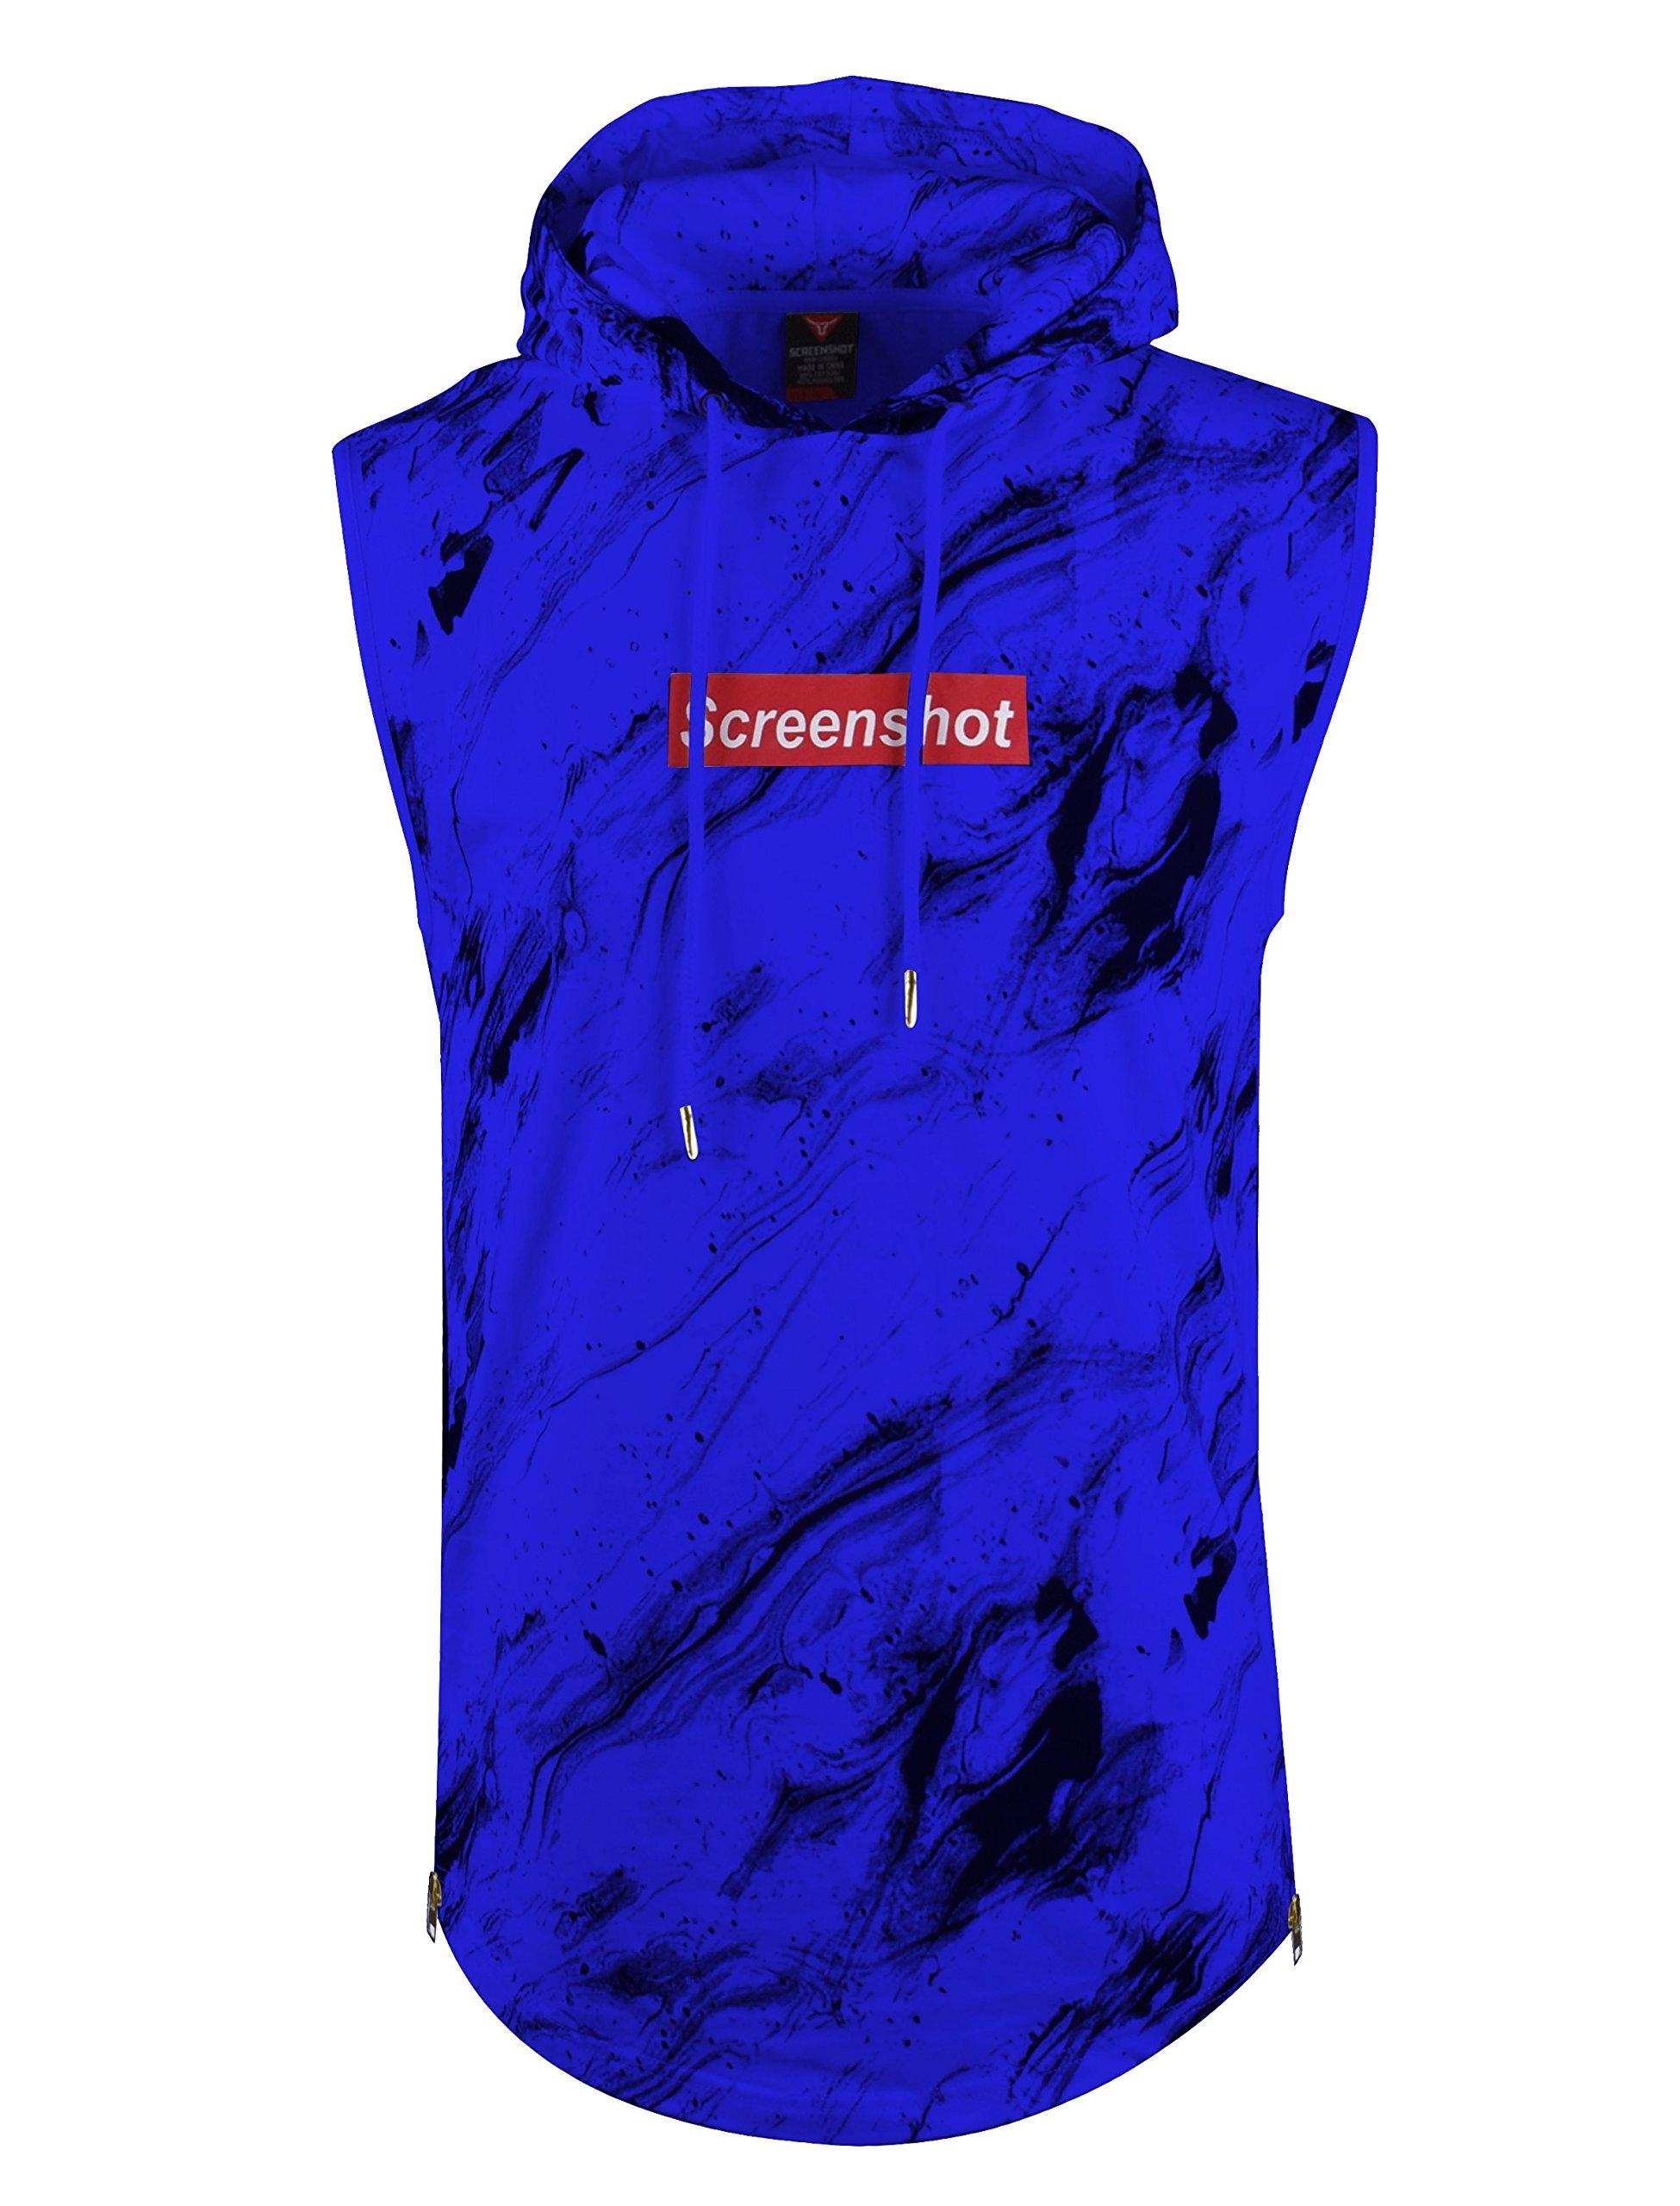 SCREENSHOTBRAND-S11808 Mens Hip Hop Longline Premium Tee - Pullover Sleeveless Hooded Fashion Screenshot Logo T-shirt - Royal - Xlarge